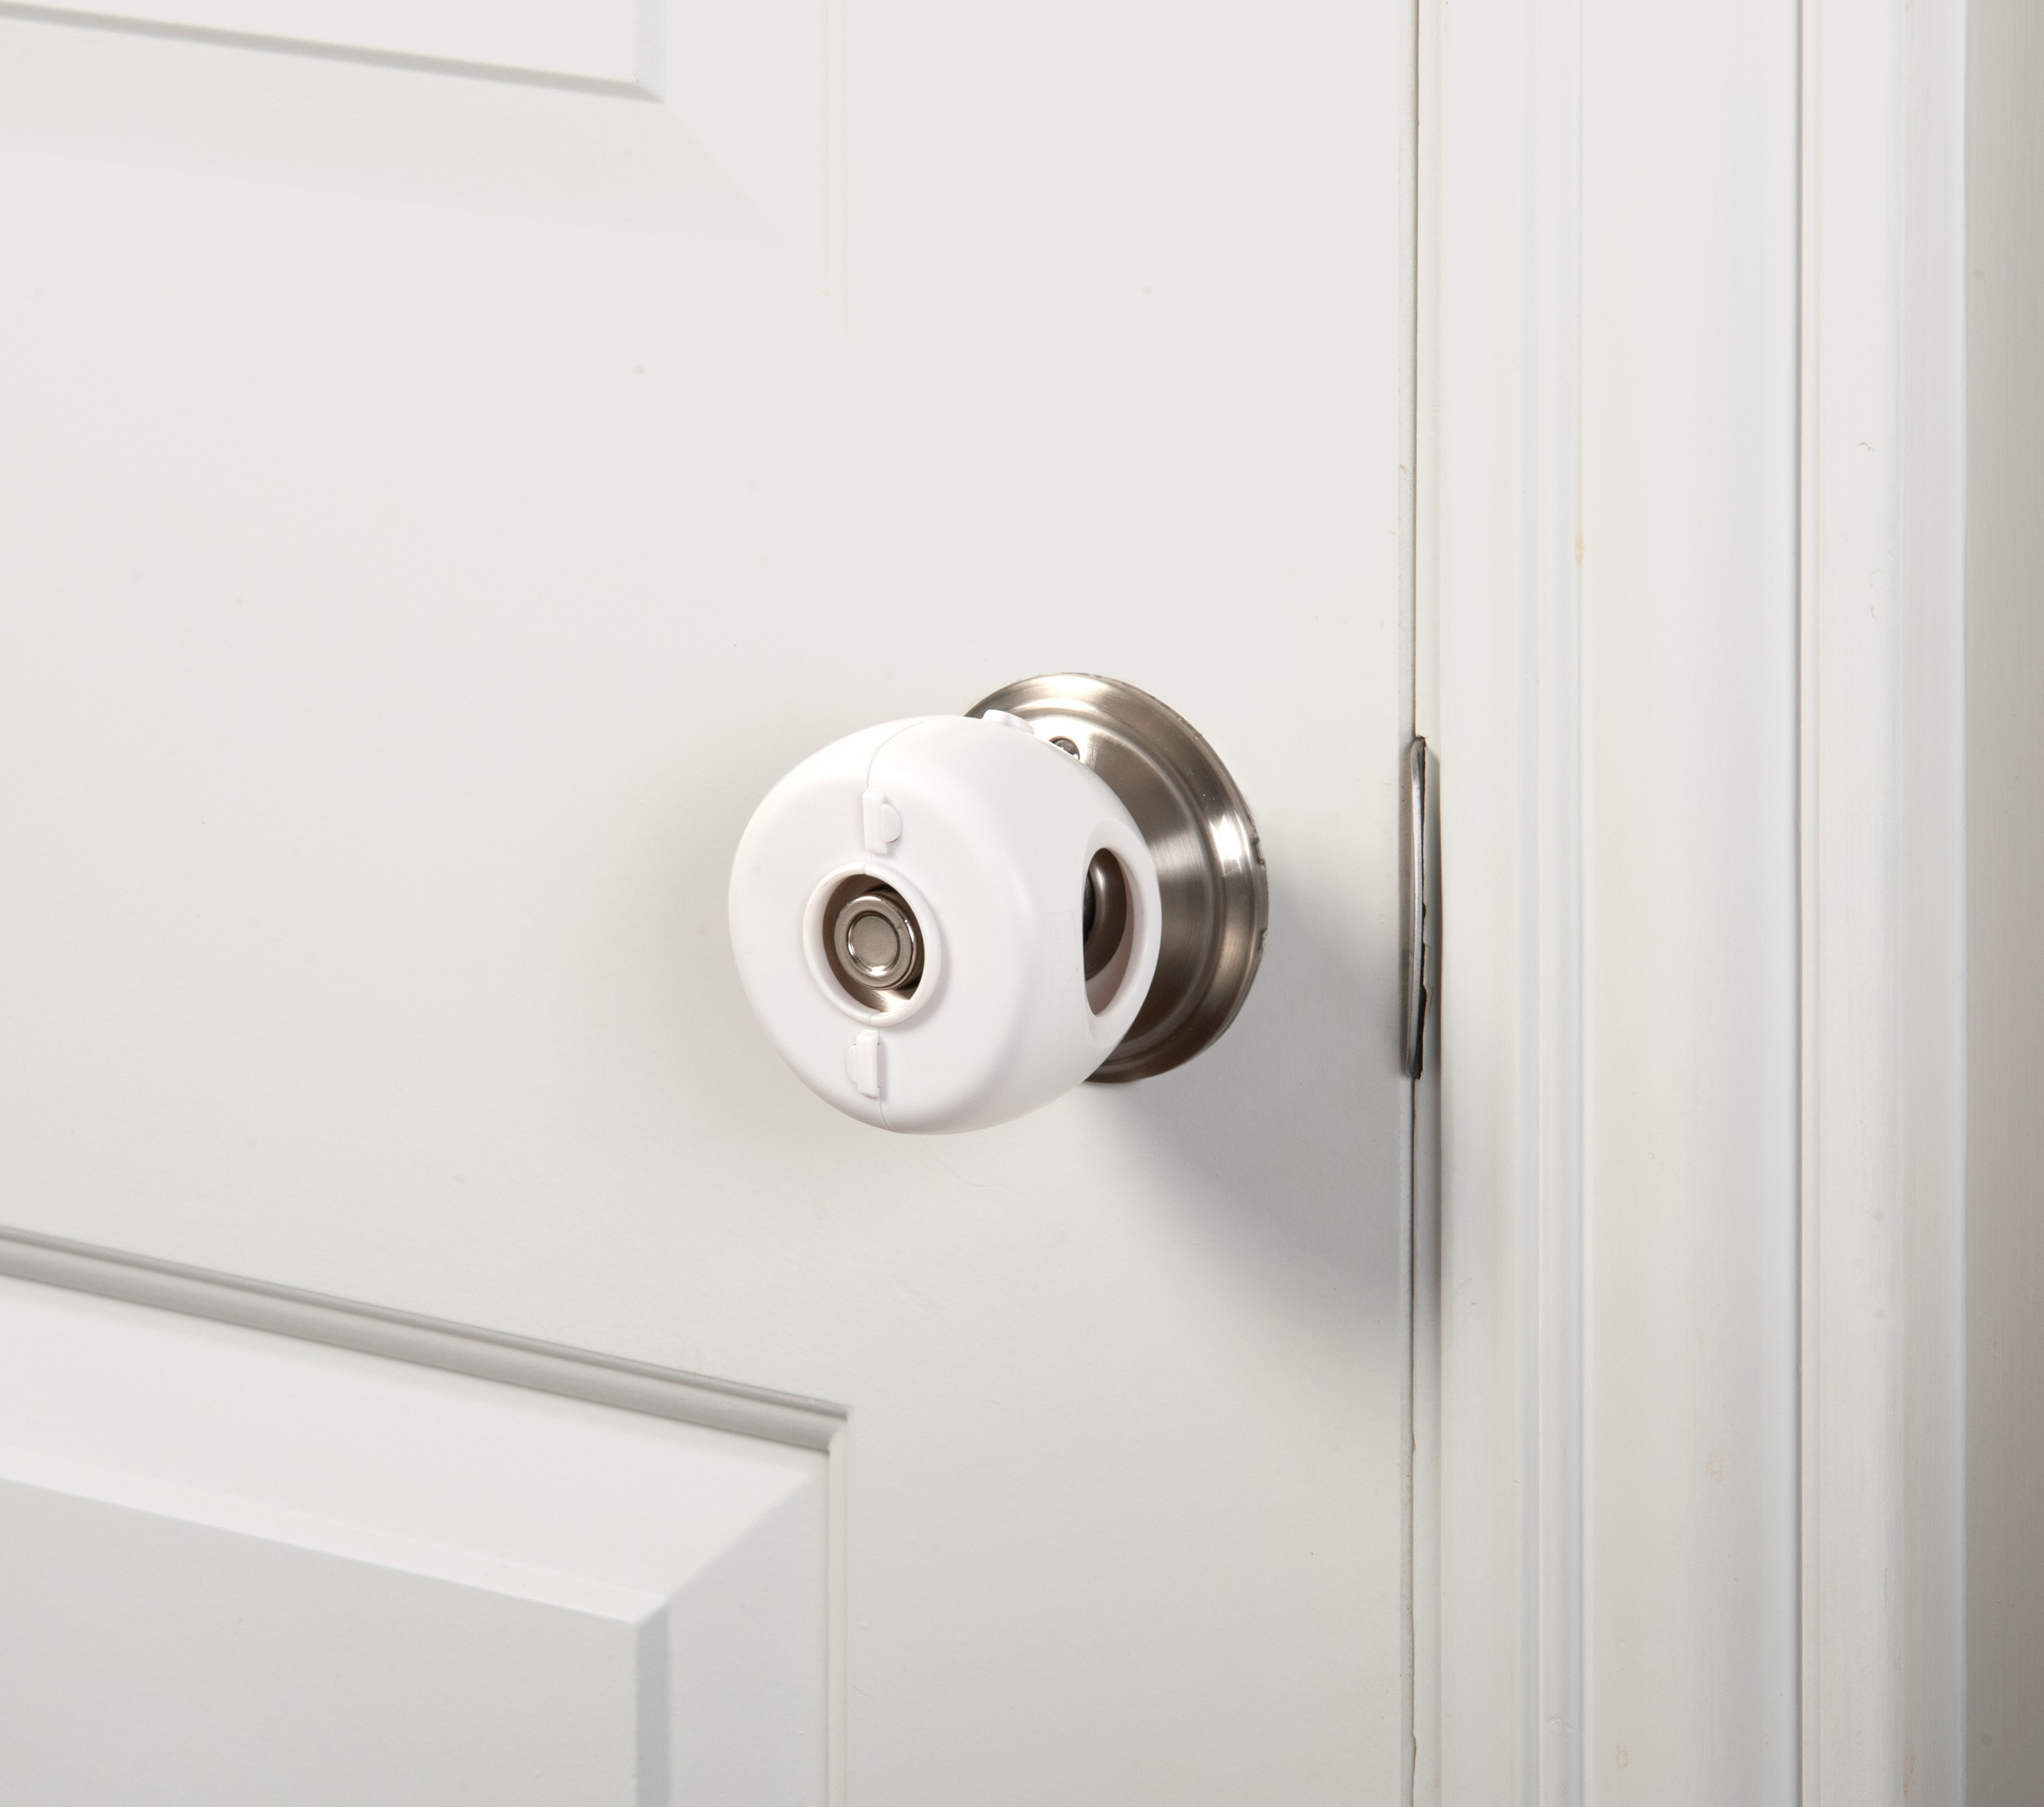 door knob protector photo - 3